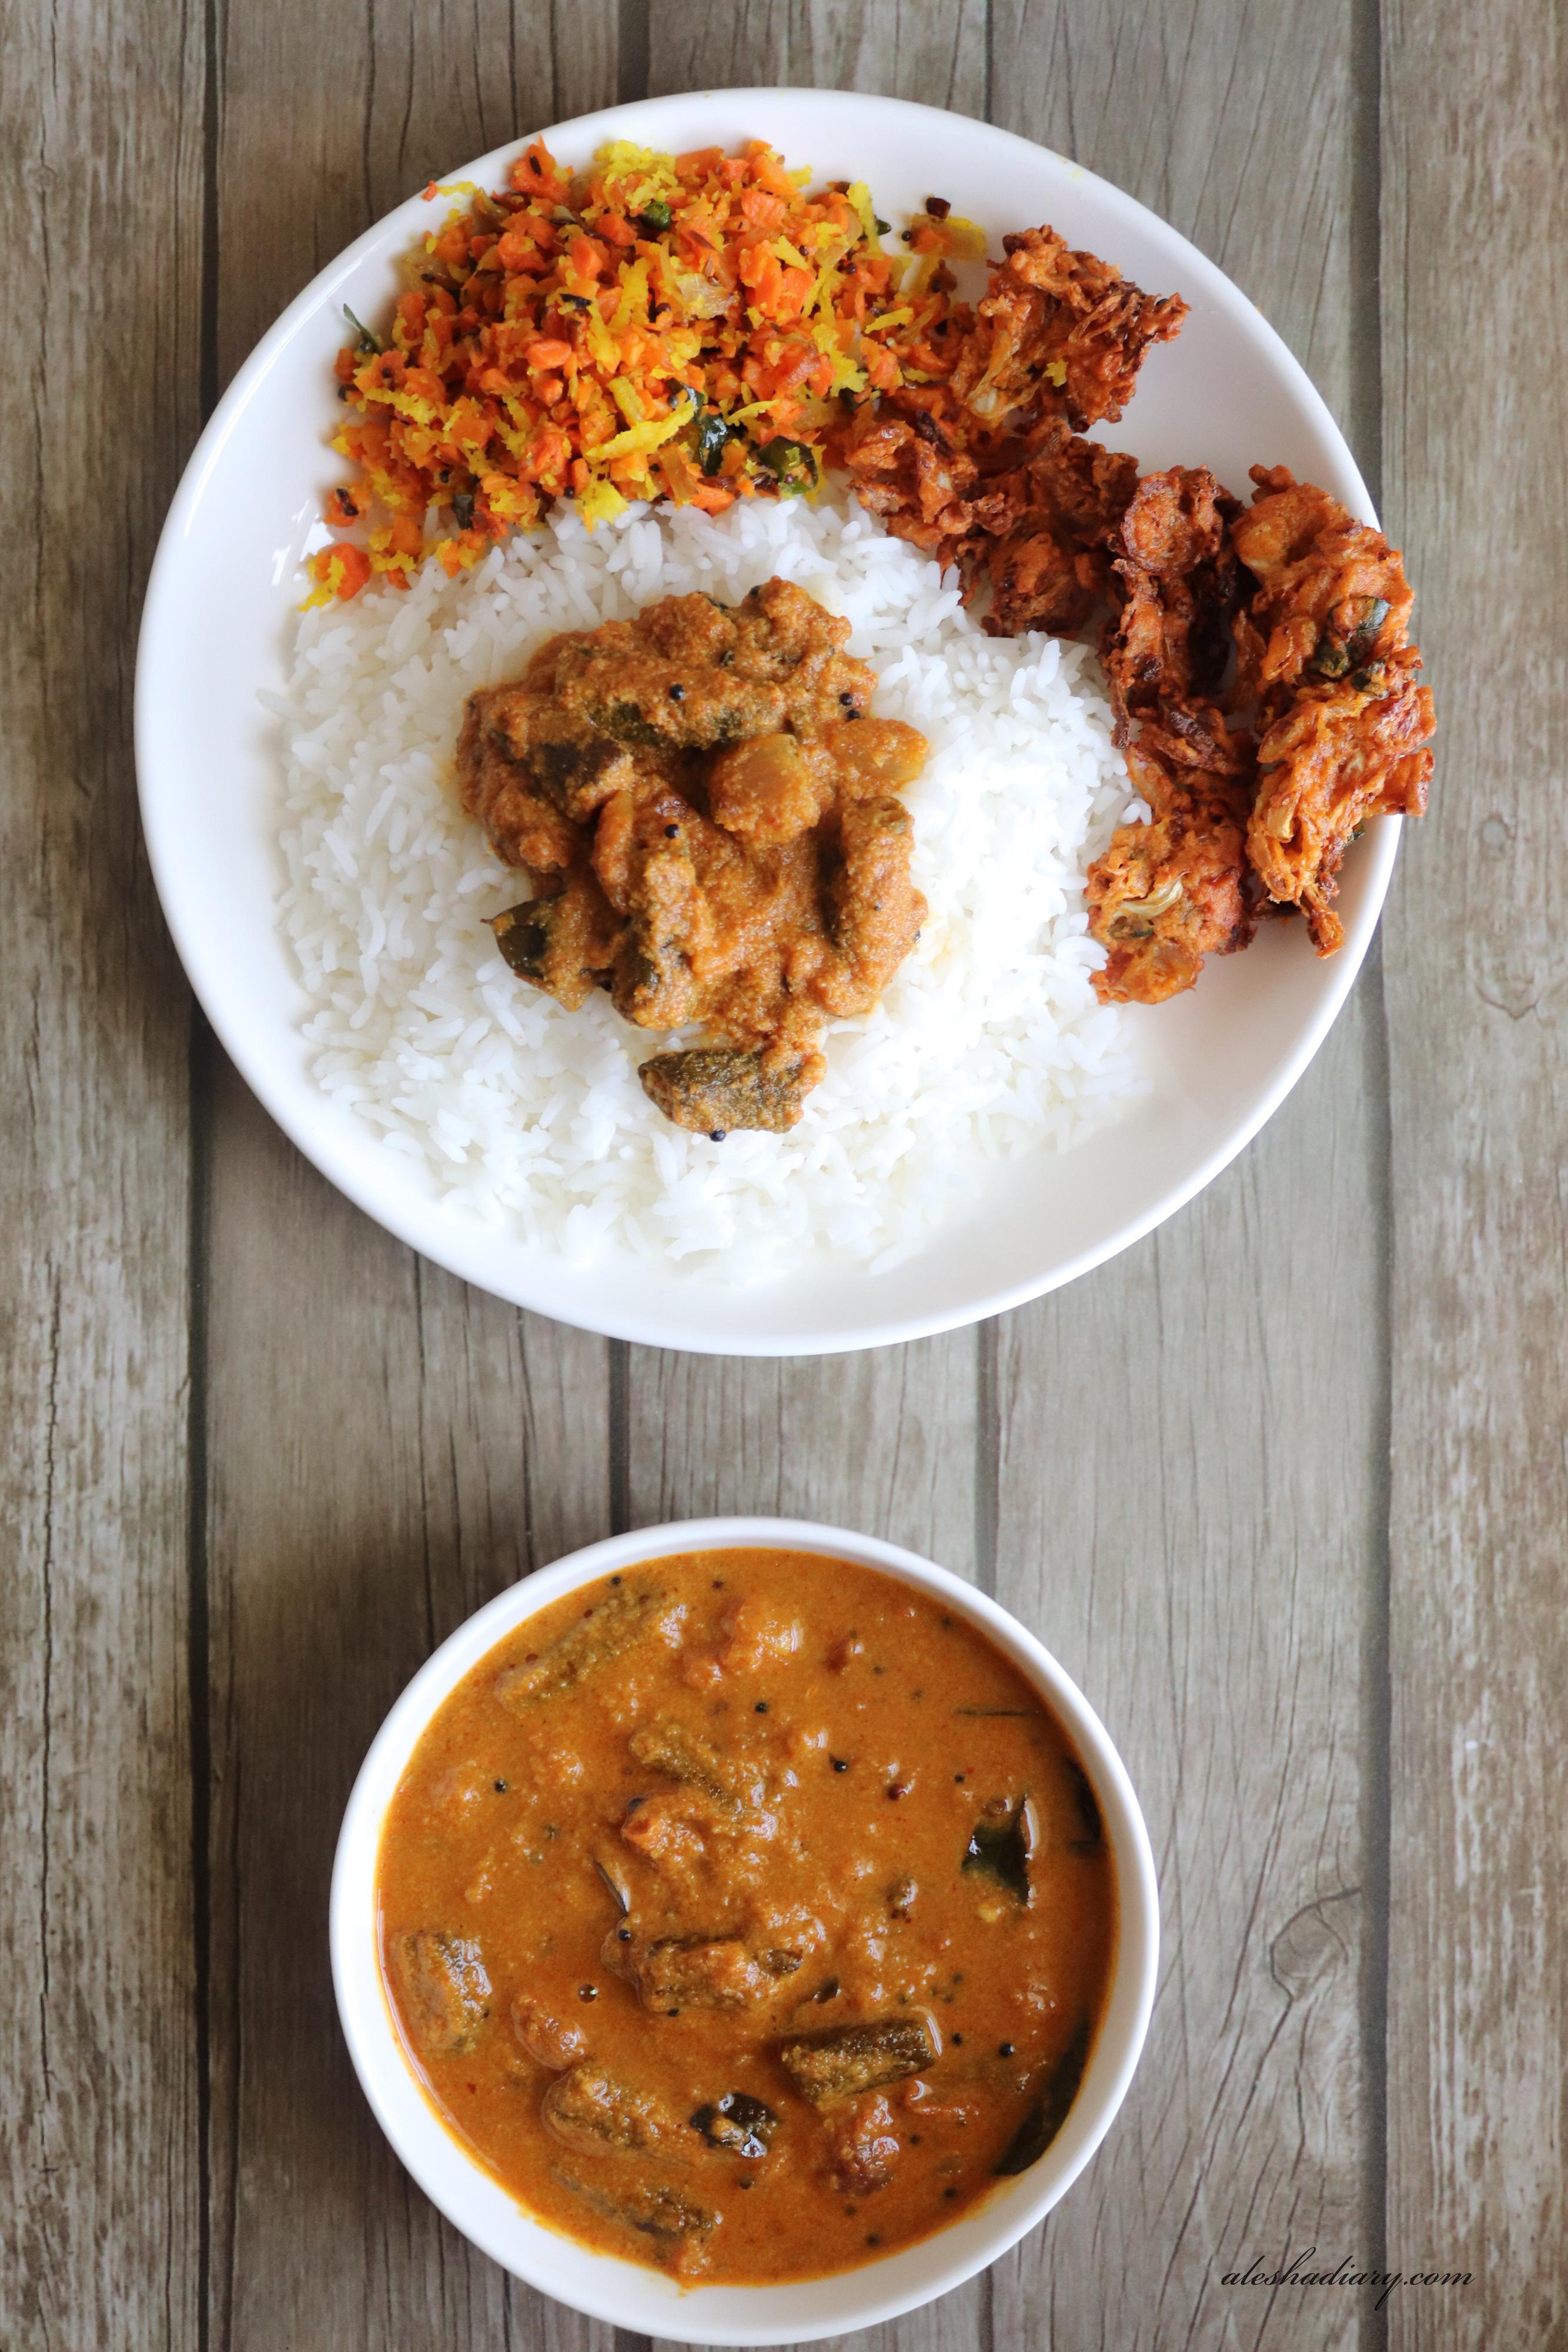 Vendakkai Puli Kuzhambu – Lady's finger curry – வெண்டைக்காய் புளி குழம்பு